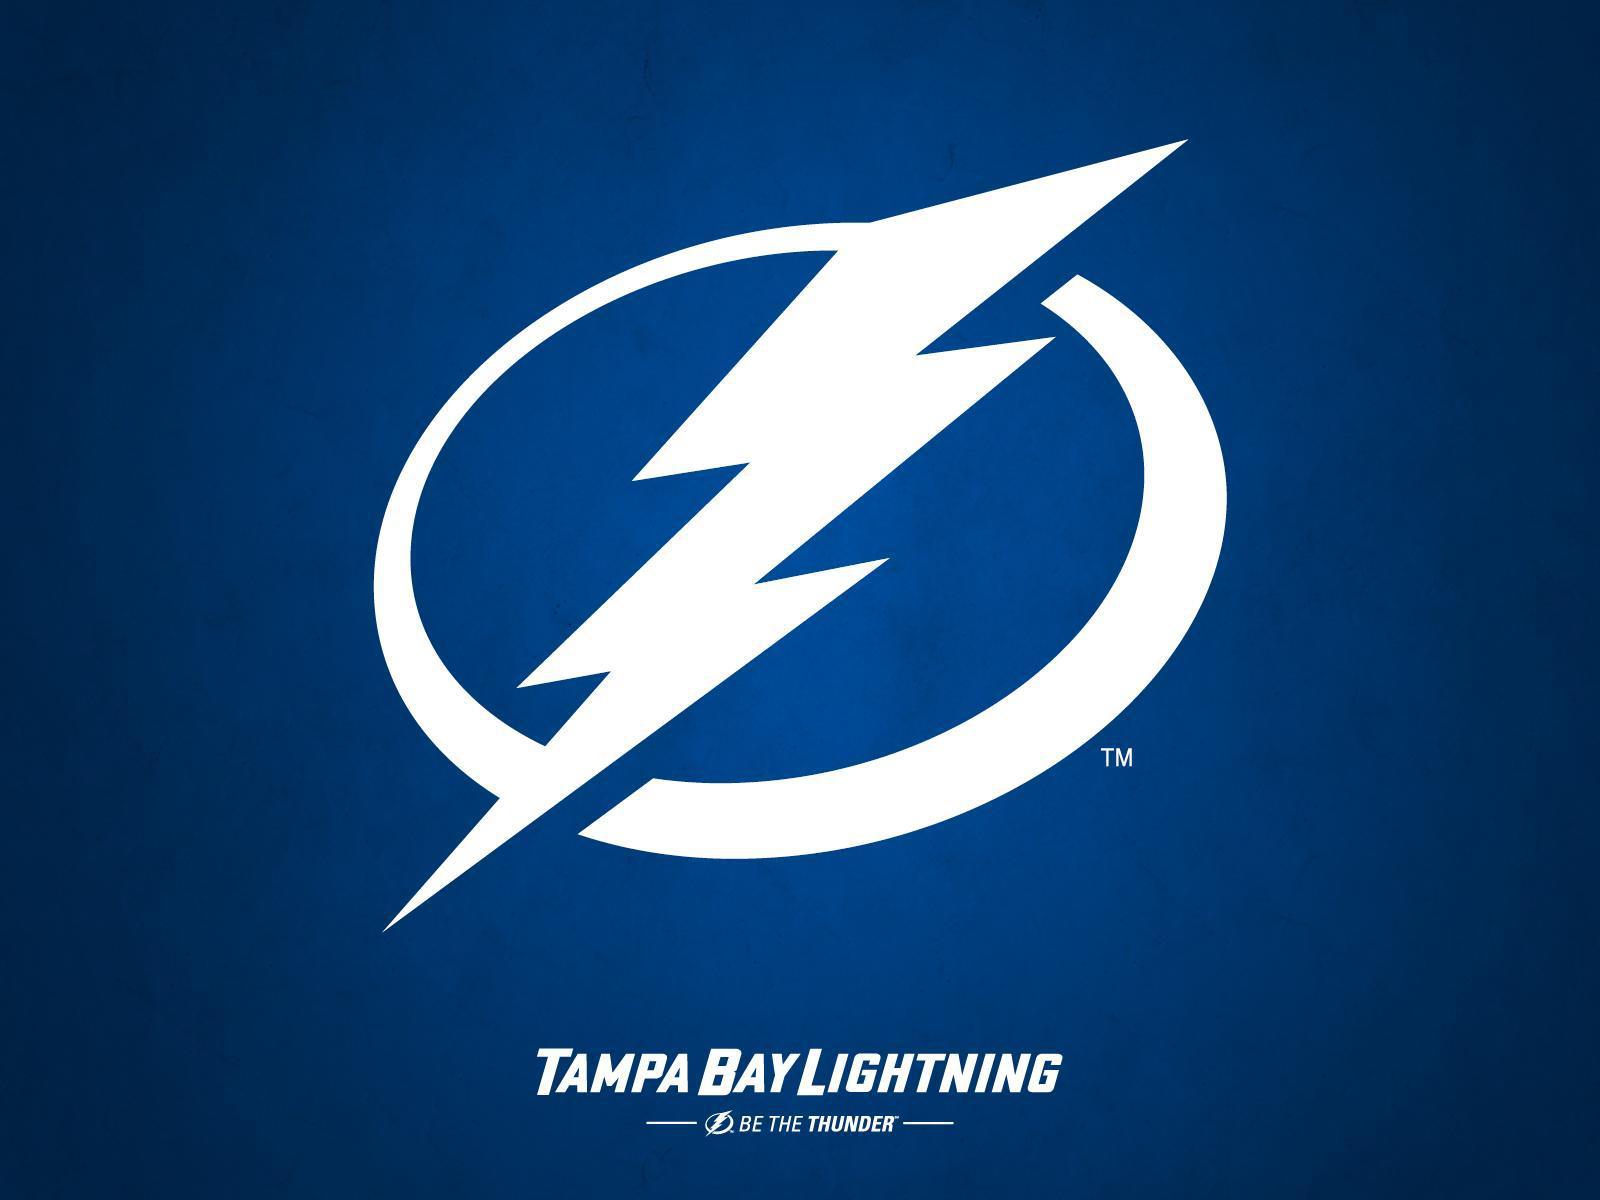 Tampa Bay Lightning Wallpaper Downloads   Wallpaper Downloads 1600x1200